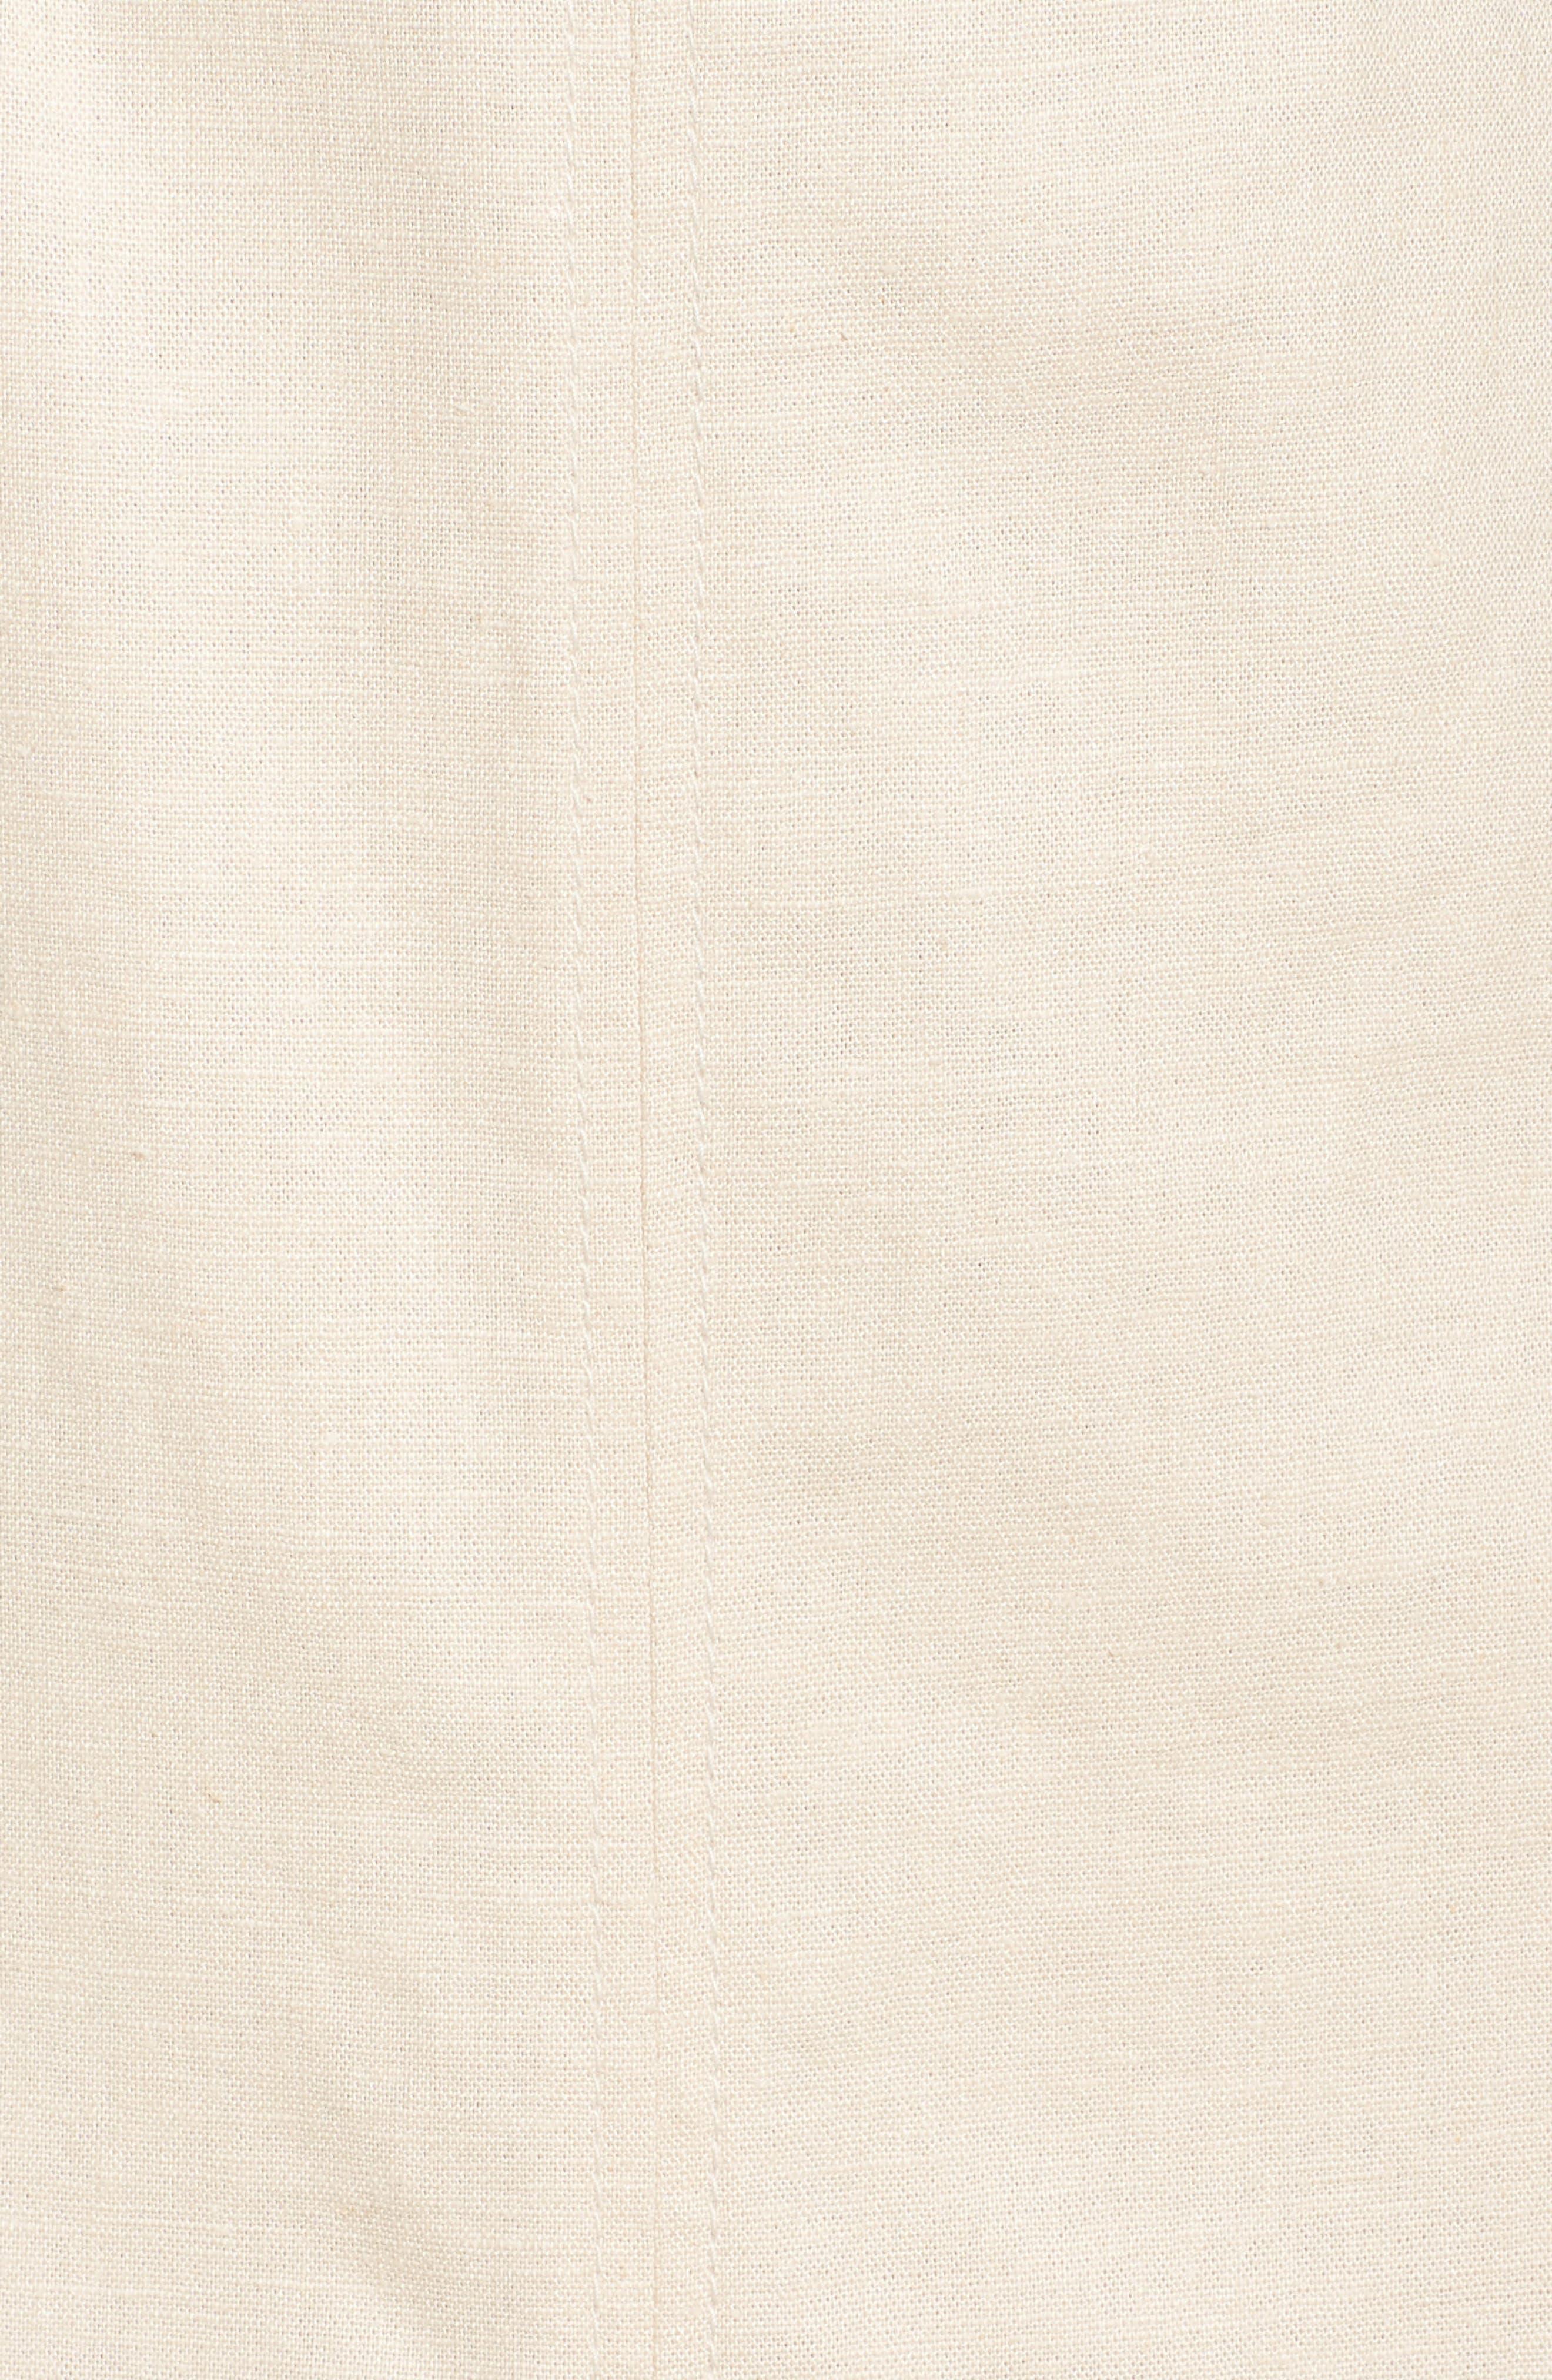 Belted Sheath Dress,                             Alternate thumbnail 5, color,                             253